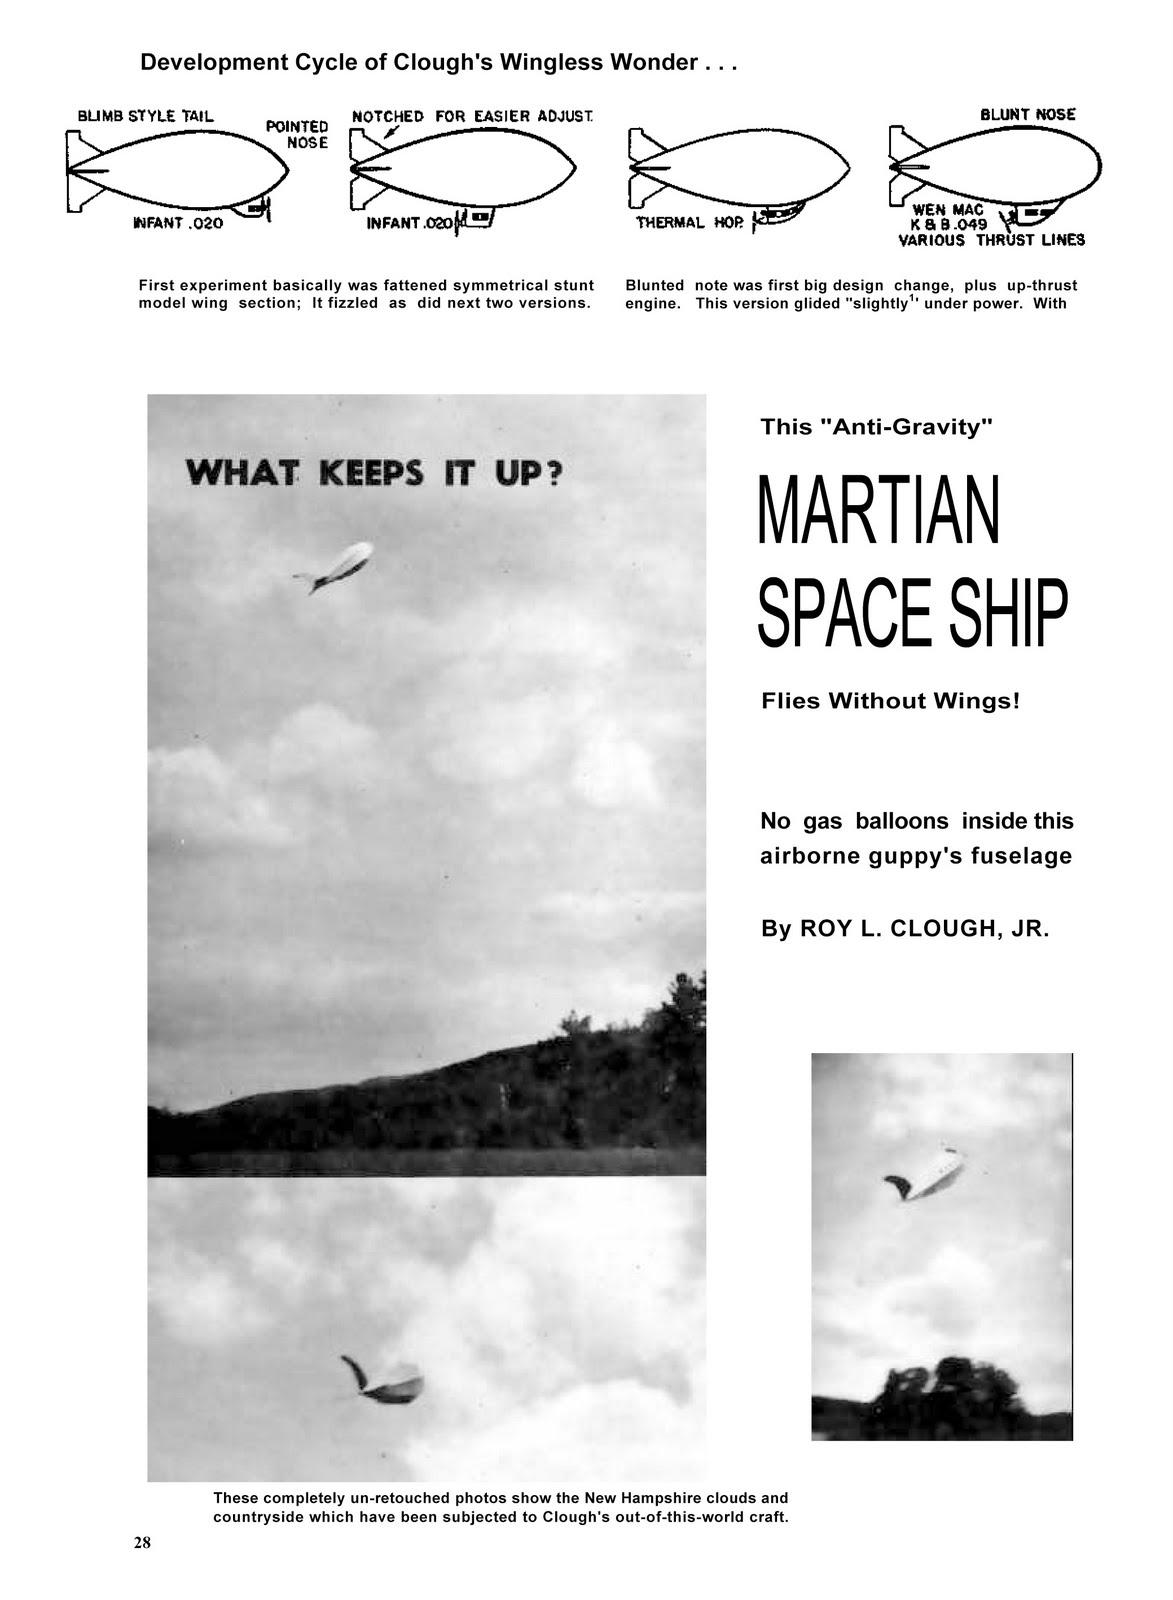 Martin-Space-Ship-nota-1.jpg